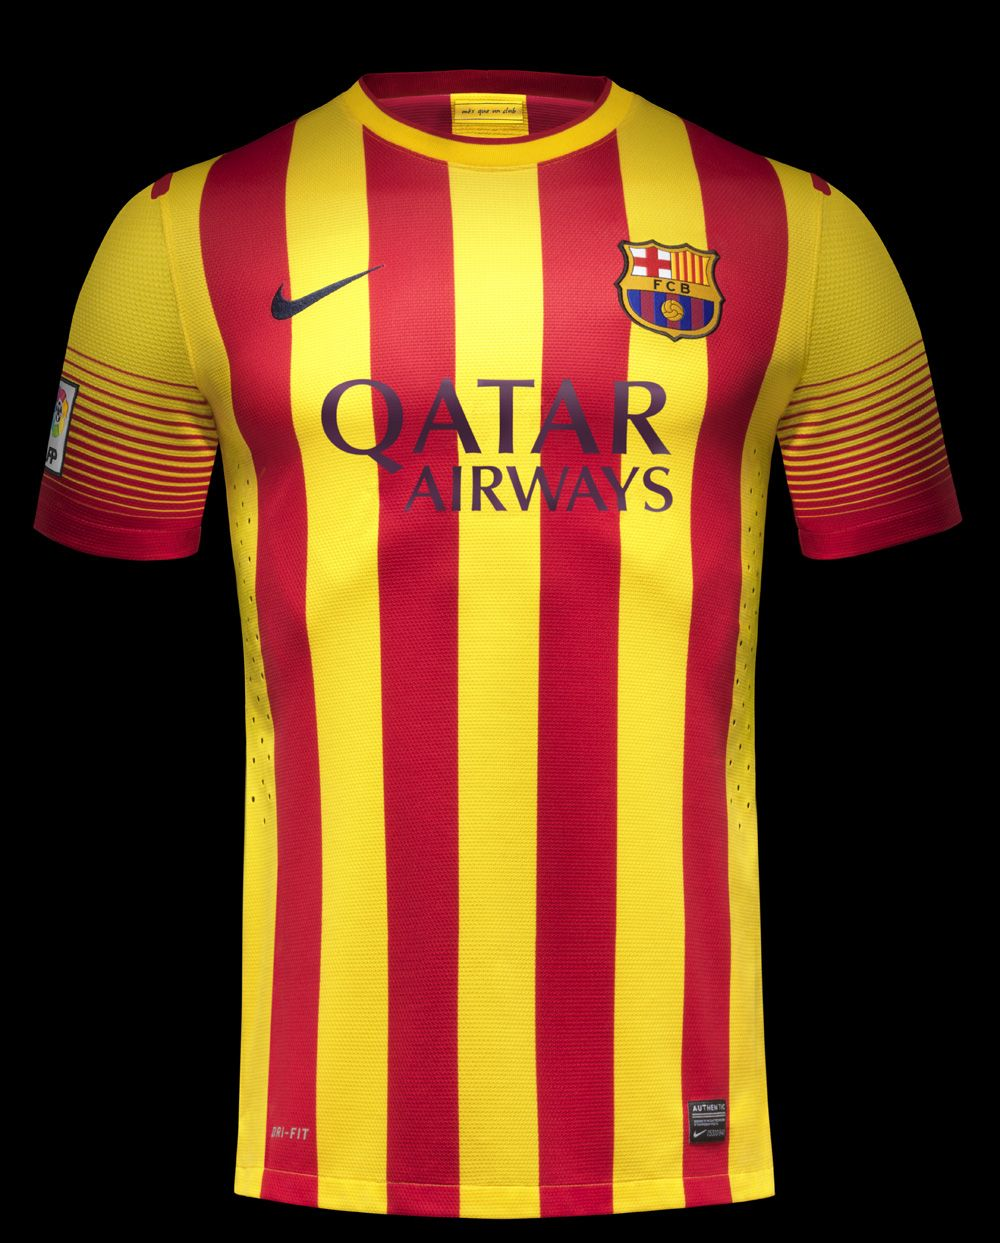 df73d6e5a54 Barcelona FC 2013-14 Away & Home Team Kit by Nike | Sports Jerseys ...